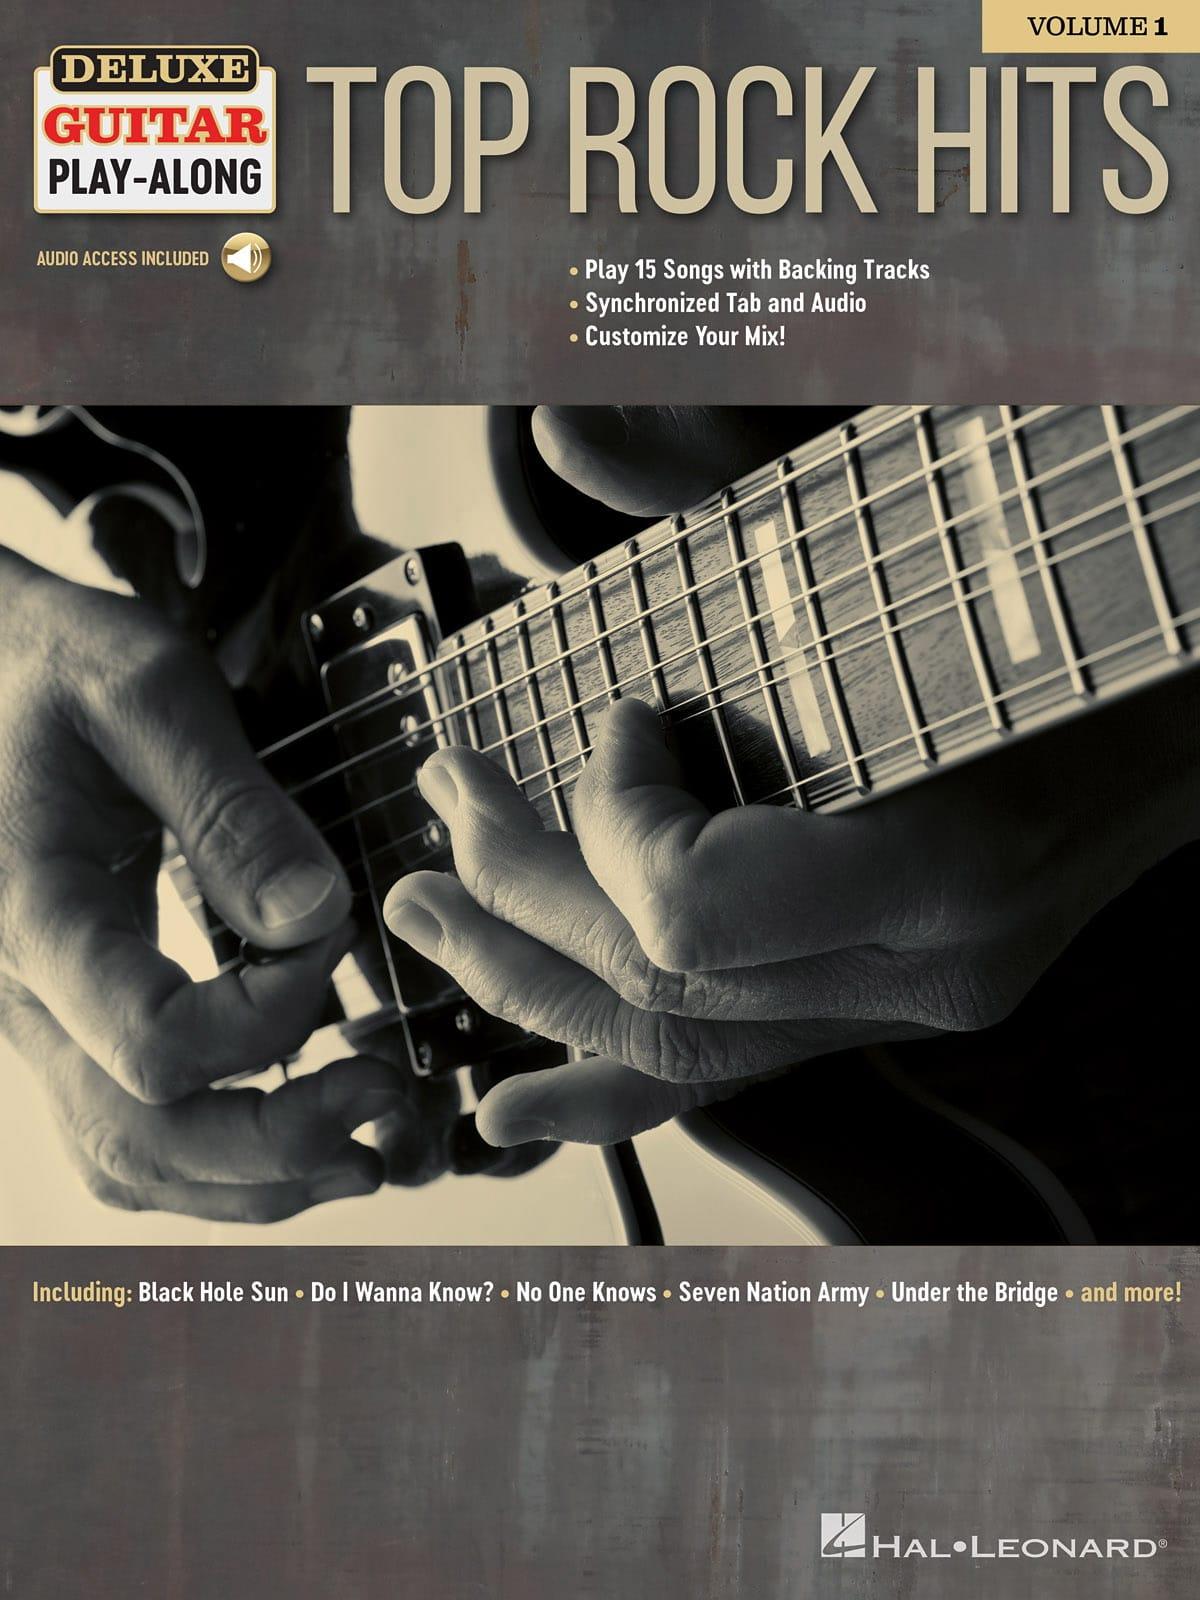 Deluxe Guitar Play-Along Volume 1 - Top Rock Hits - laflutedepan.com